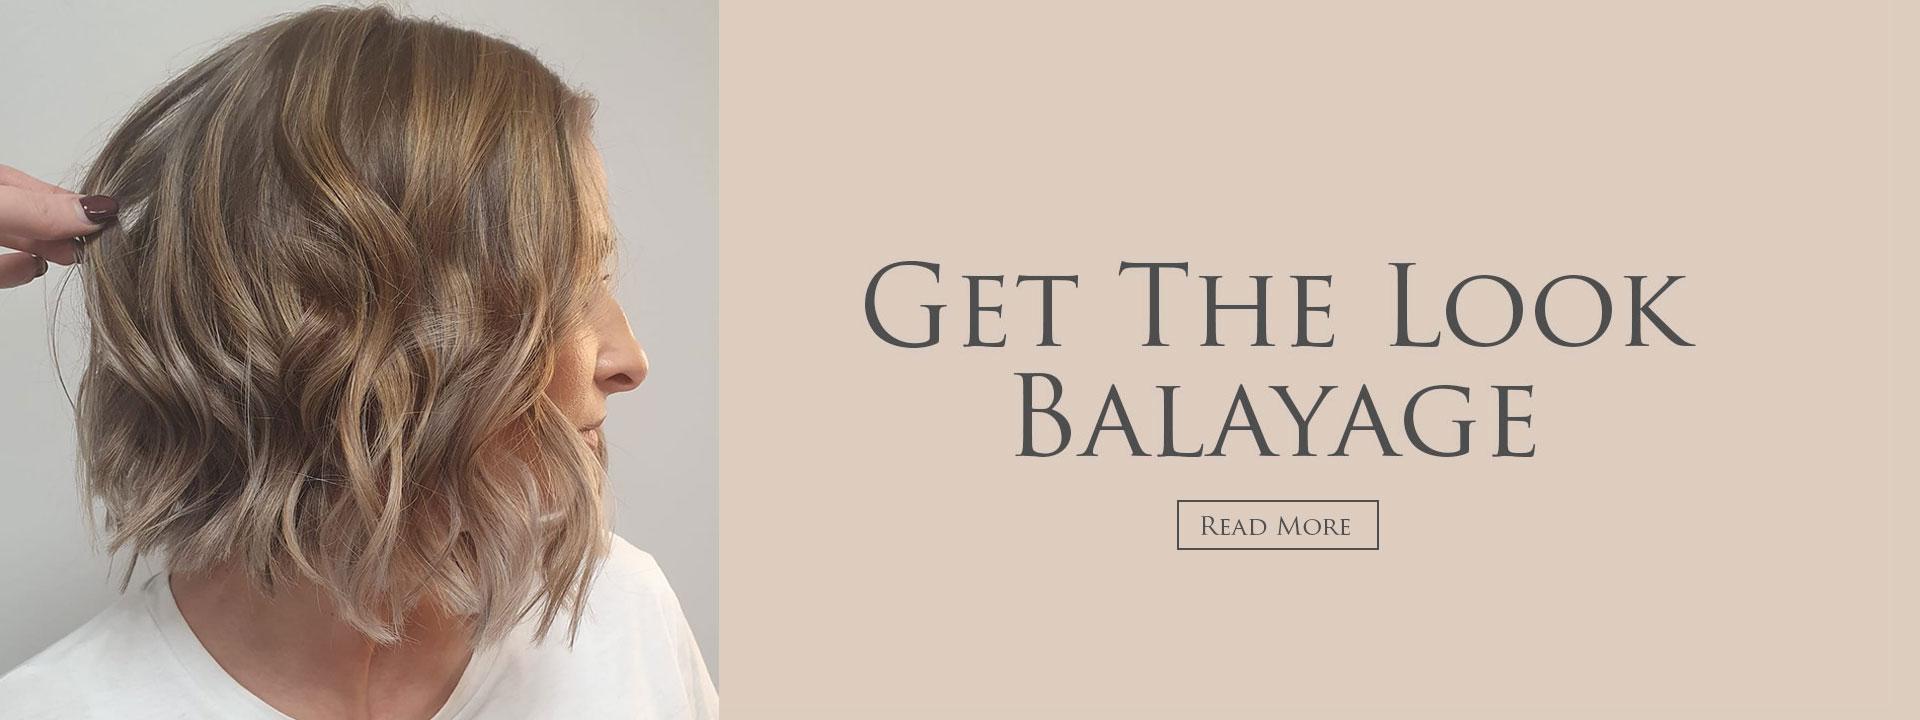 Get the look - Balayage